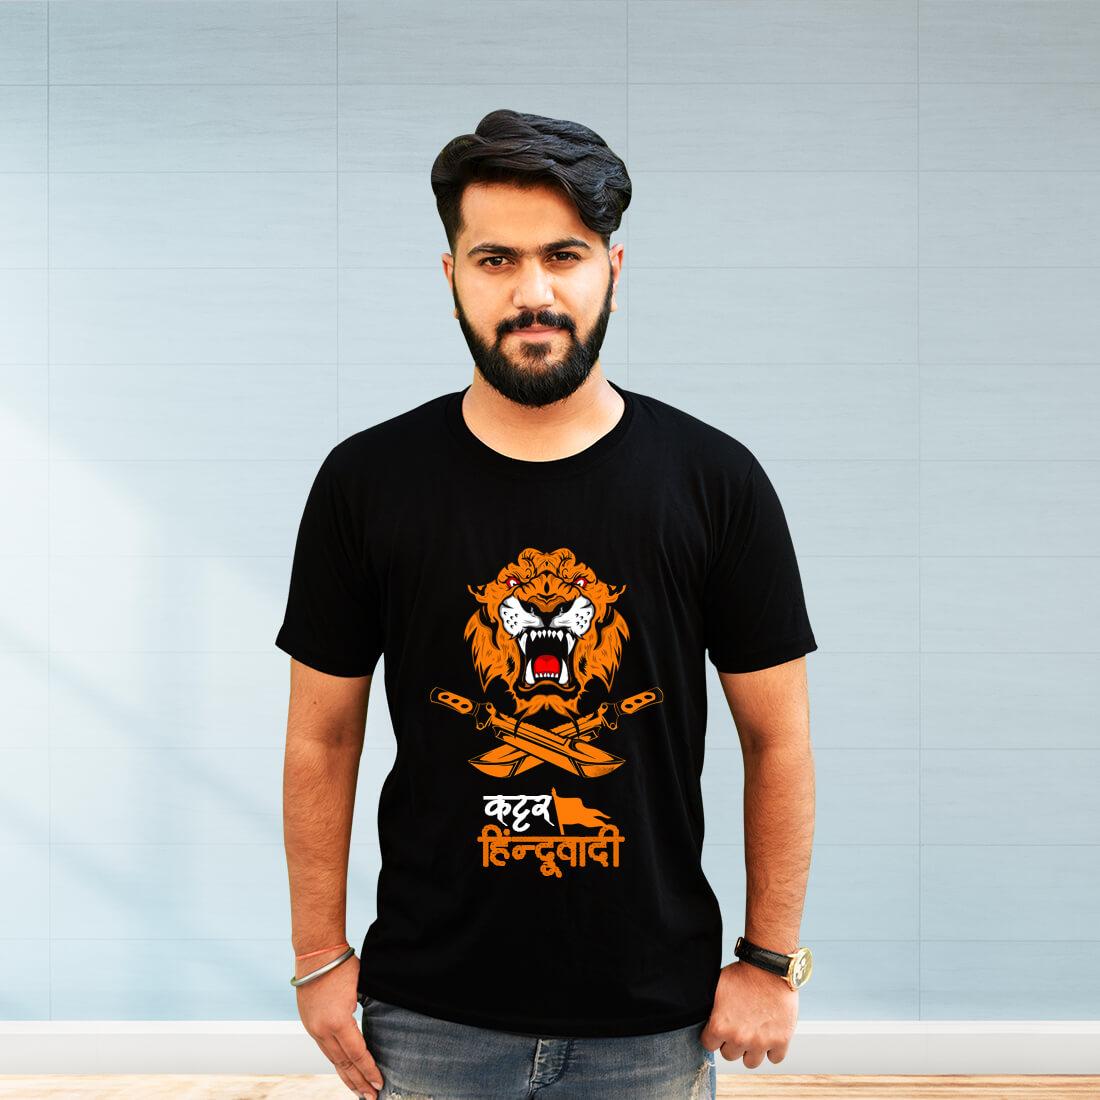 Kattar Hinduvadi Quotes Printed Plain Black T Shirt